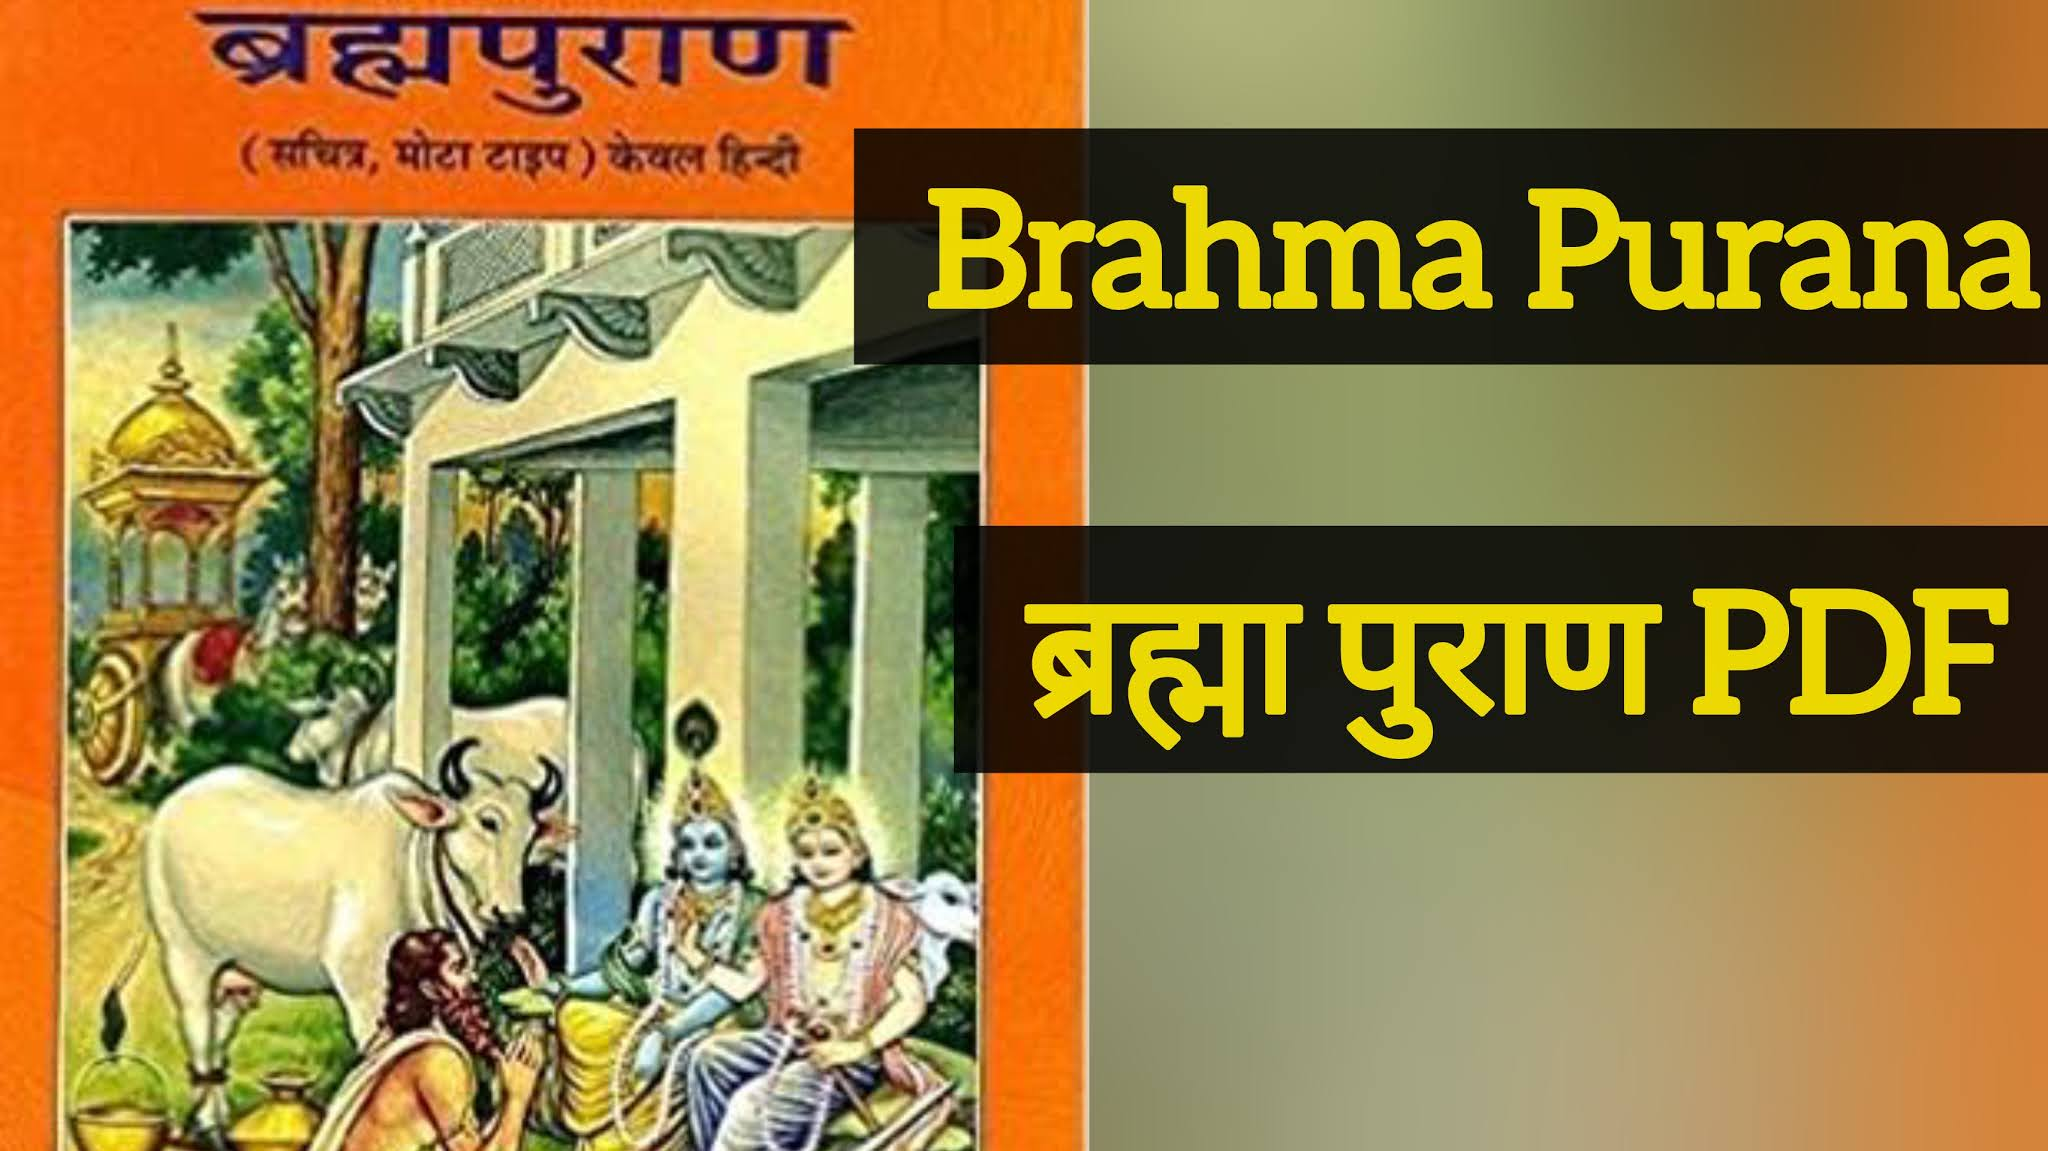 Brahma Purana (ब्रह्म पुराण) PDF in Sanskrit, Hindi